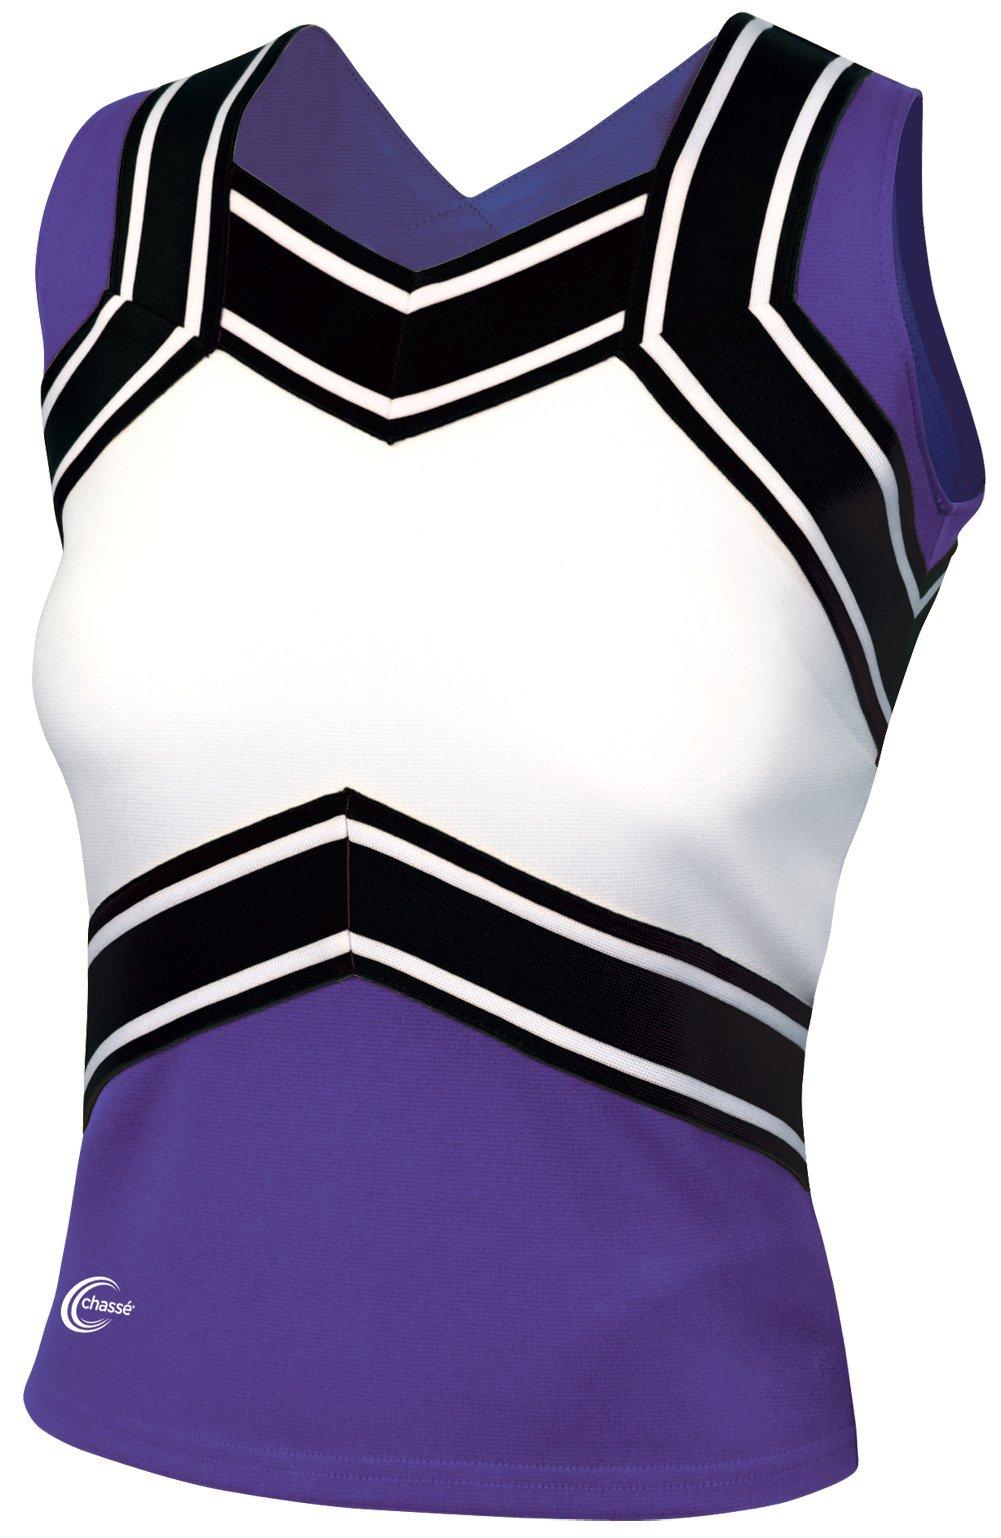 Chassé Girls' Blaze Shell Top Purple/White/Black Youth X-Small